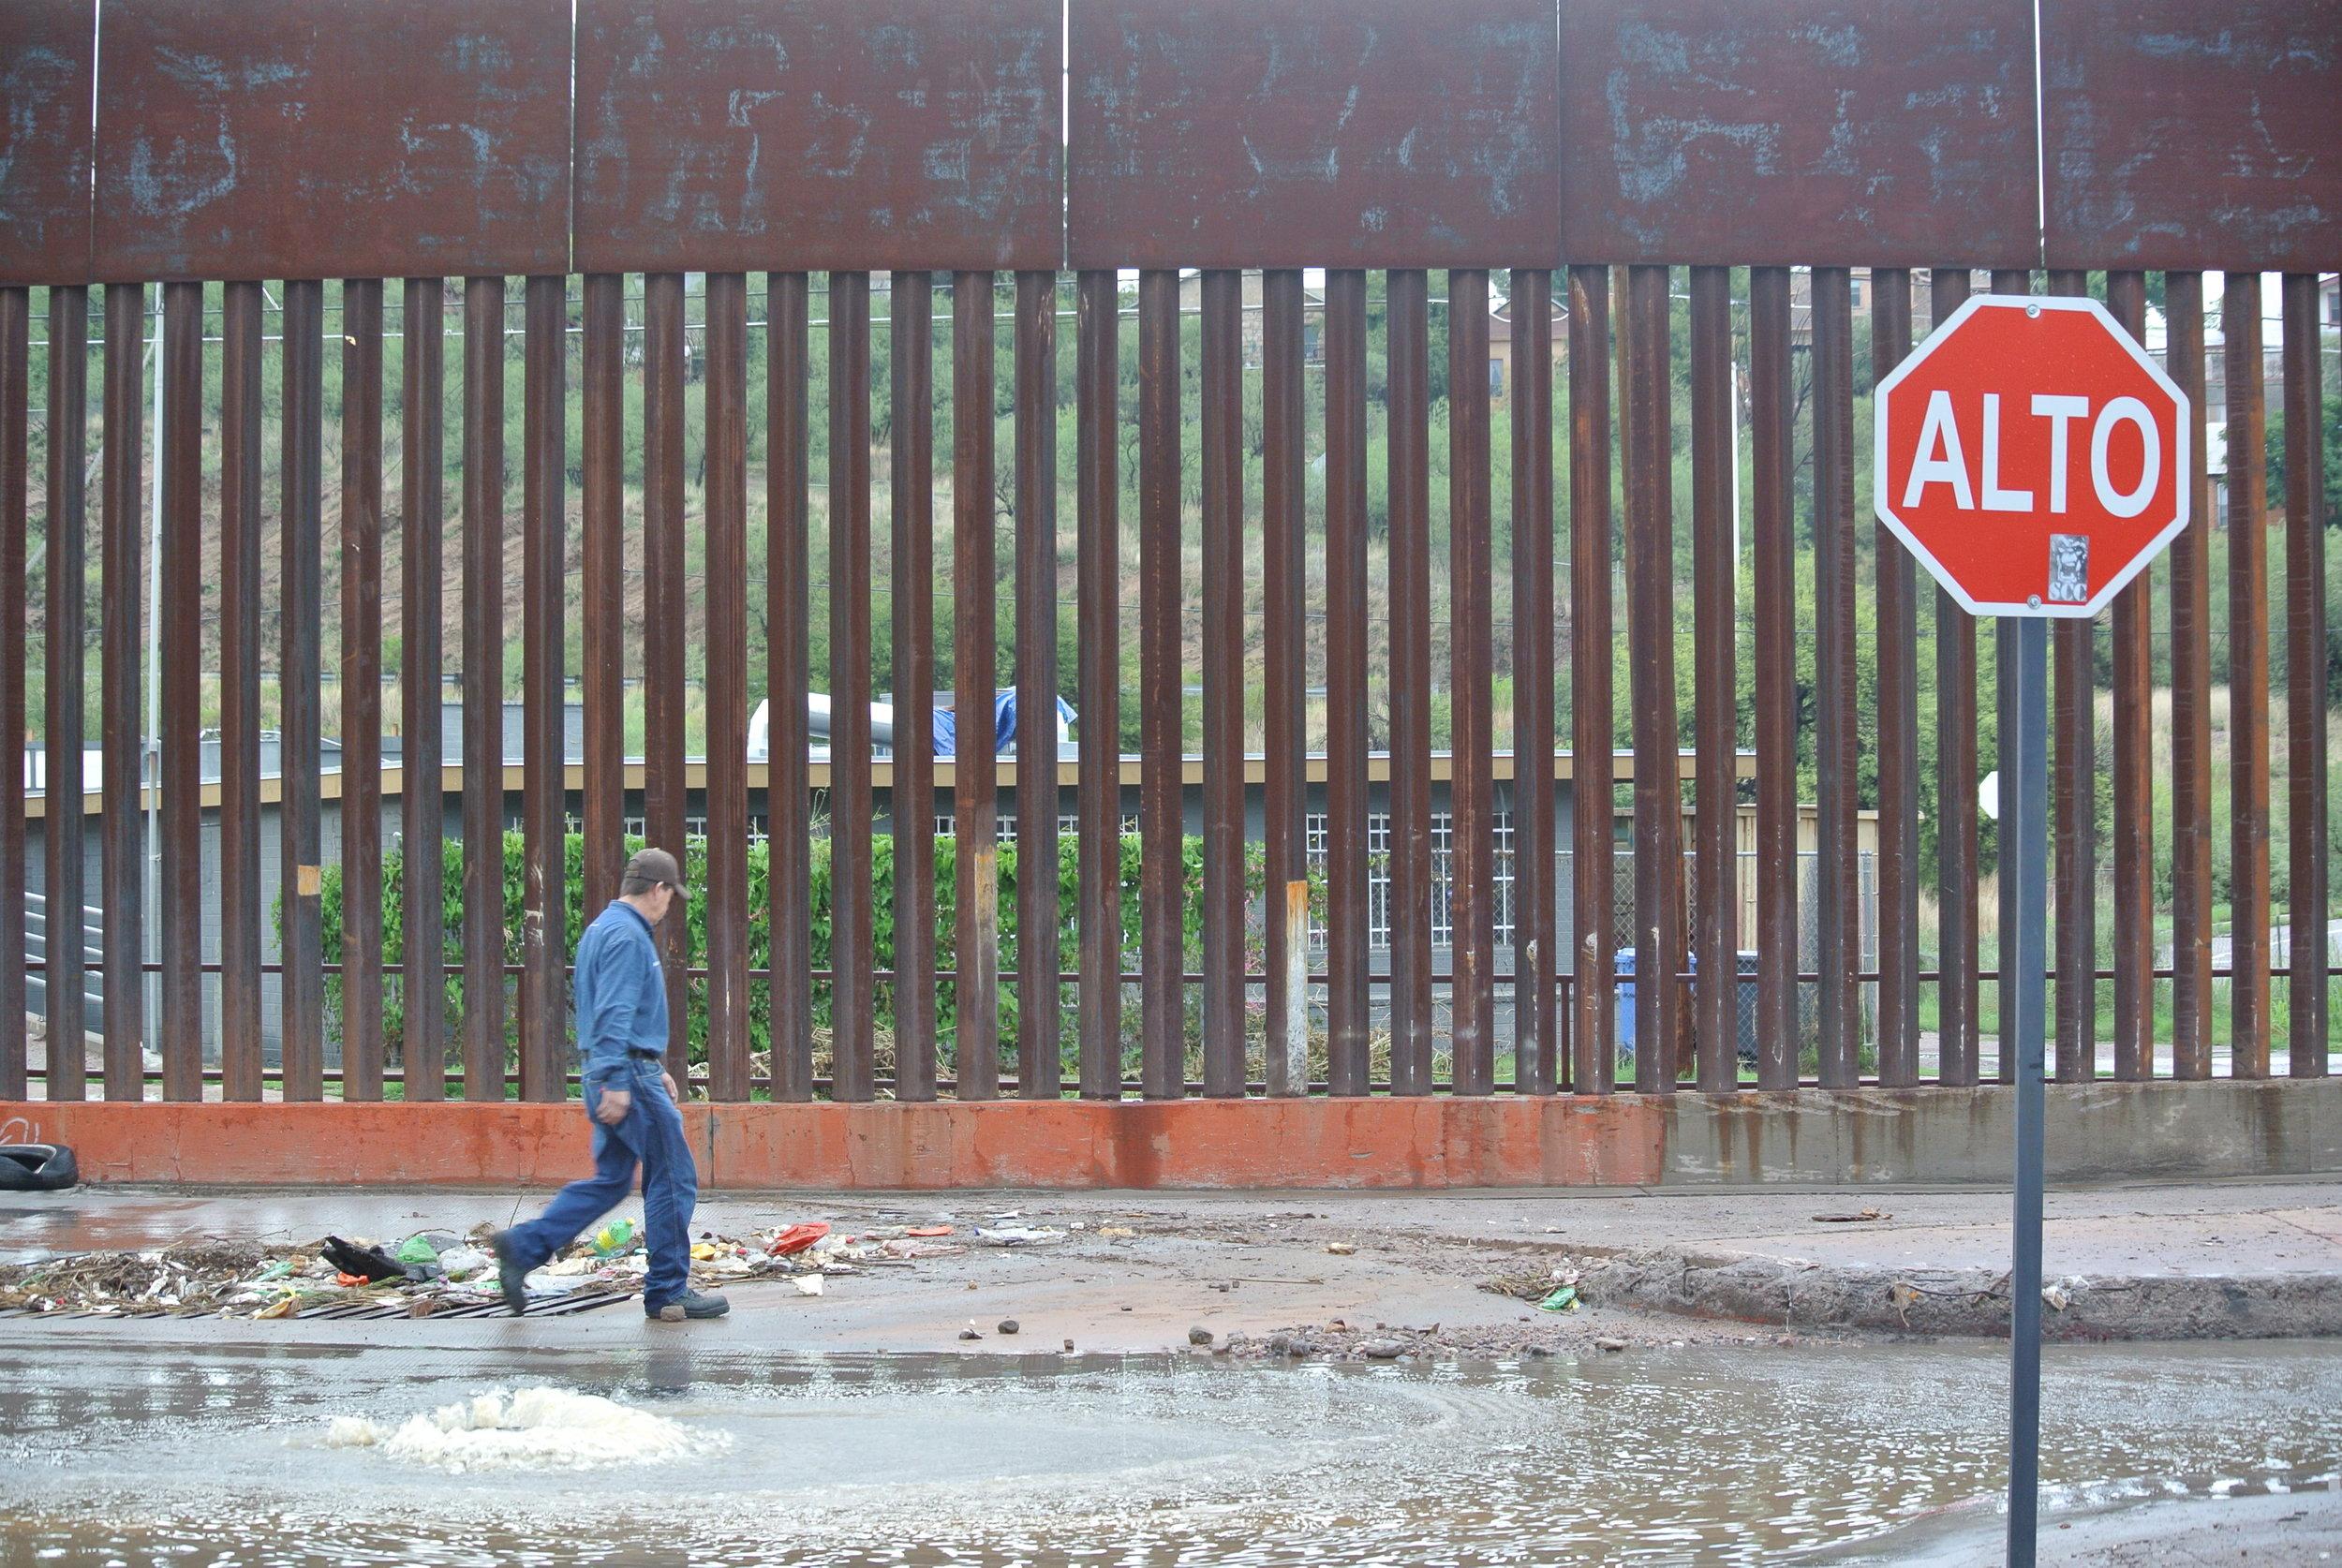 Beside the US-Mexico border wall. Nogales, Mexico; July 2017. © Pamela Kerpius